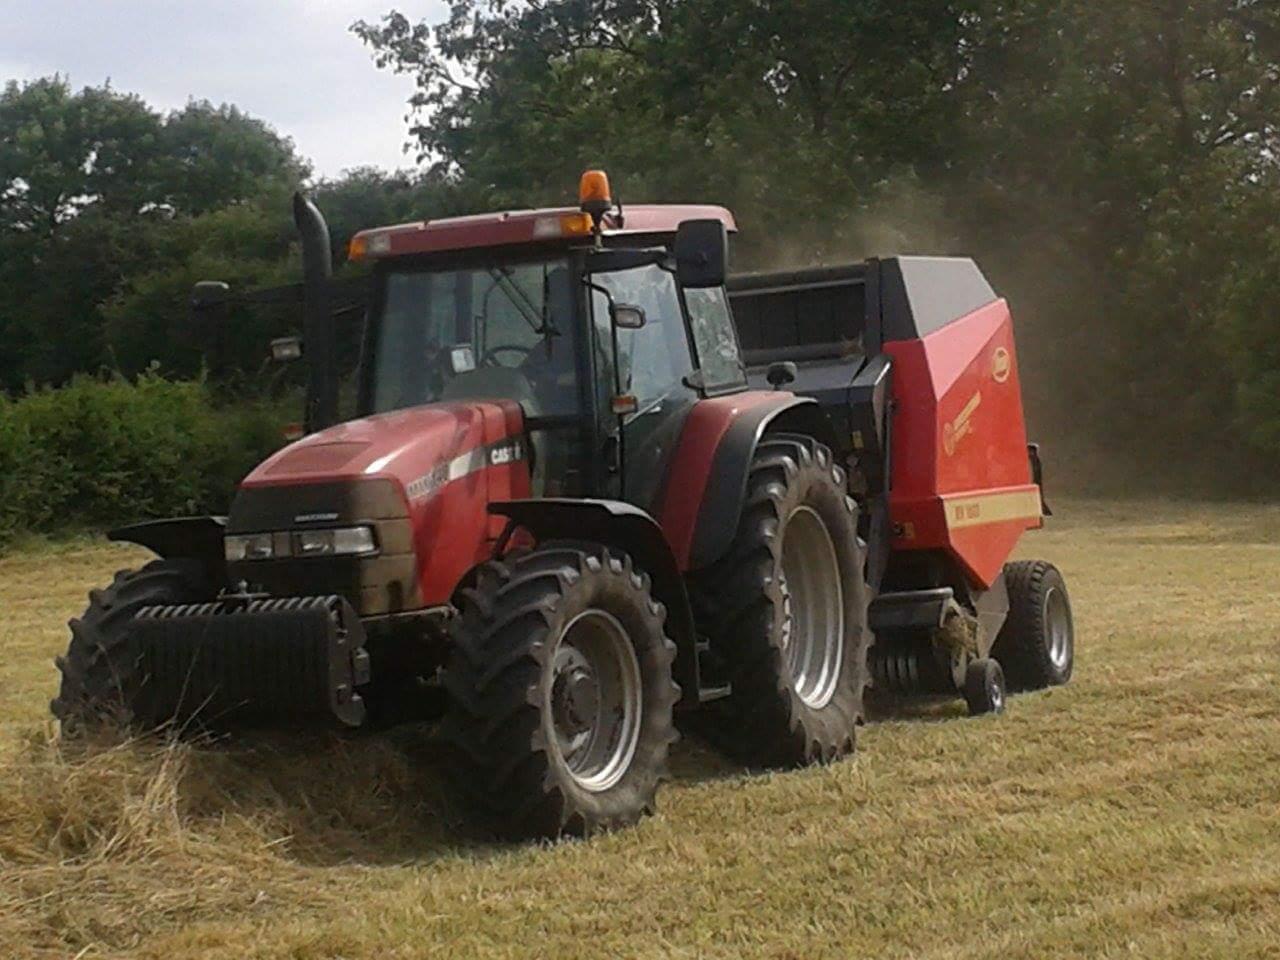 A K R ELLIOTT FARM SERVICES LIMITED - Gotham, Nottinghamshire NG11 0LF - 01159 831359 | ShowMeLocal.com